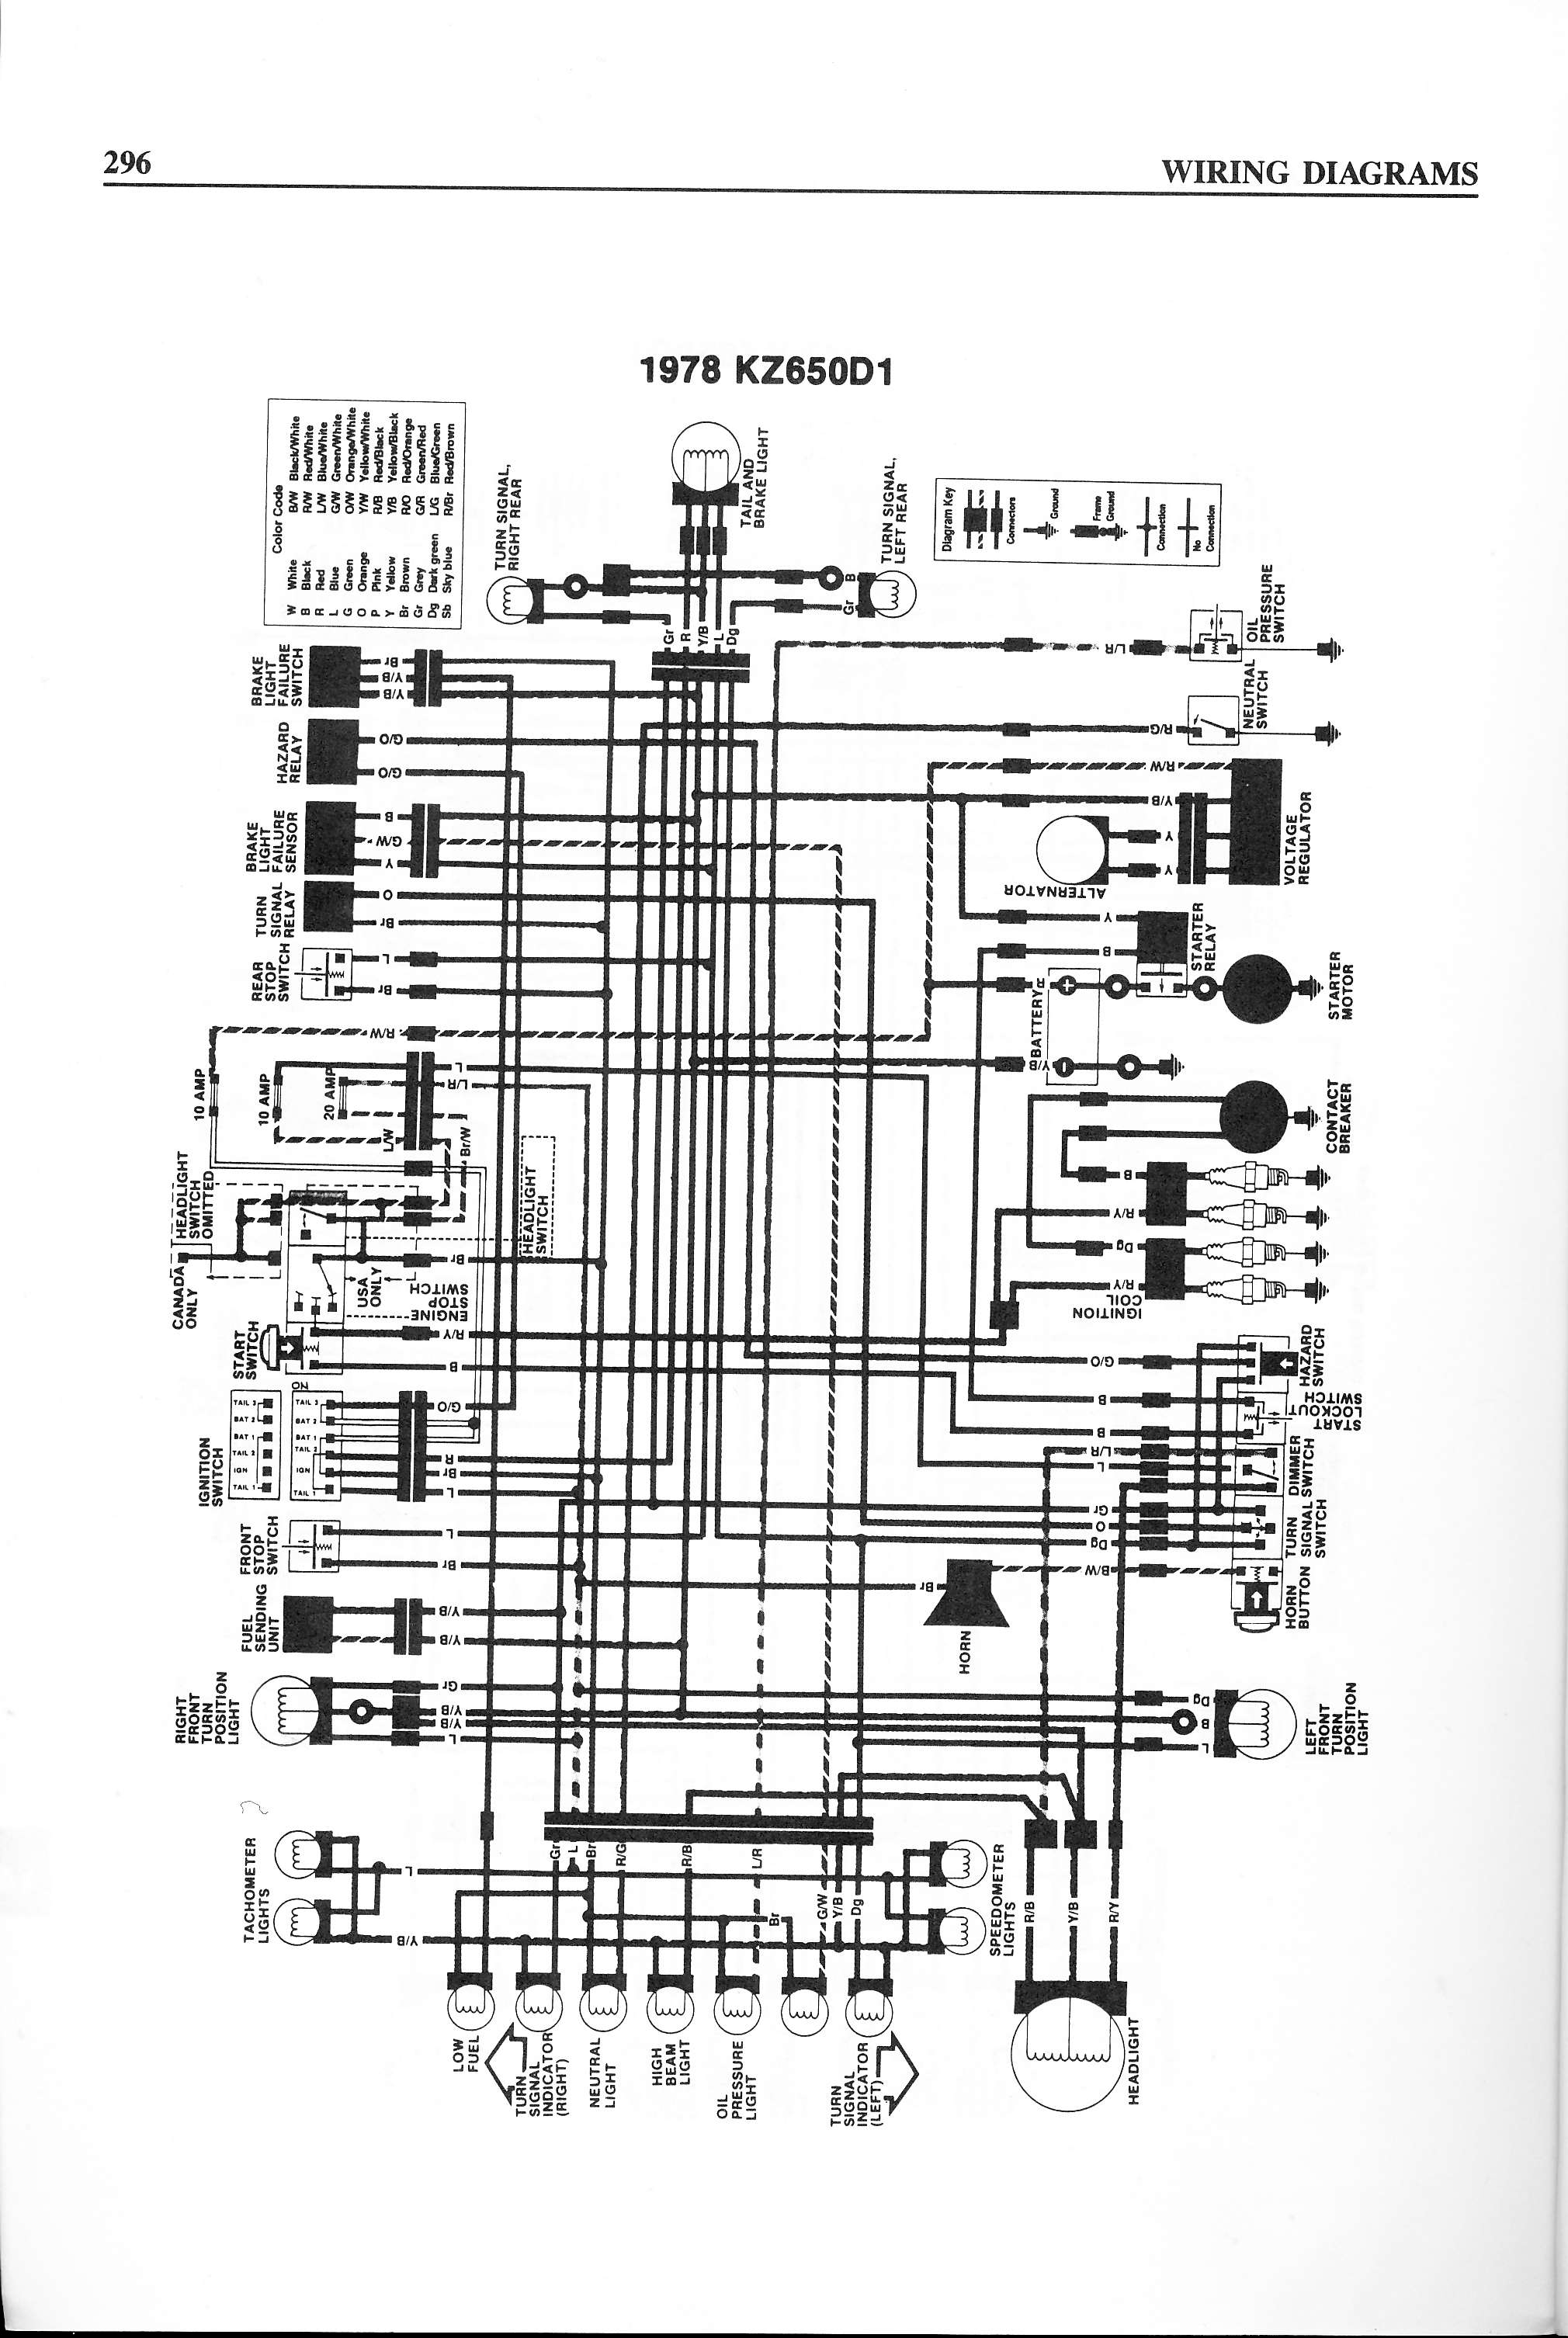 DIAGRAM] Pioneer Avic D2 Wiring Diagram FULL Version HD Quality Wiring  Diagram - CARRYBOYPHIL.K-DANSE.FRK-danse.fr